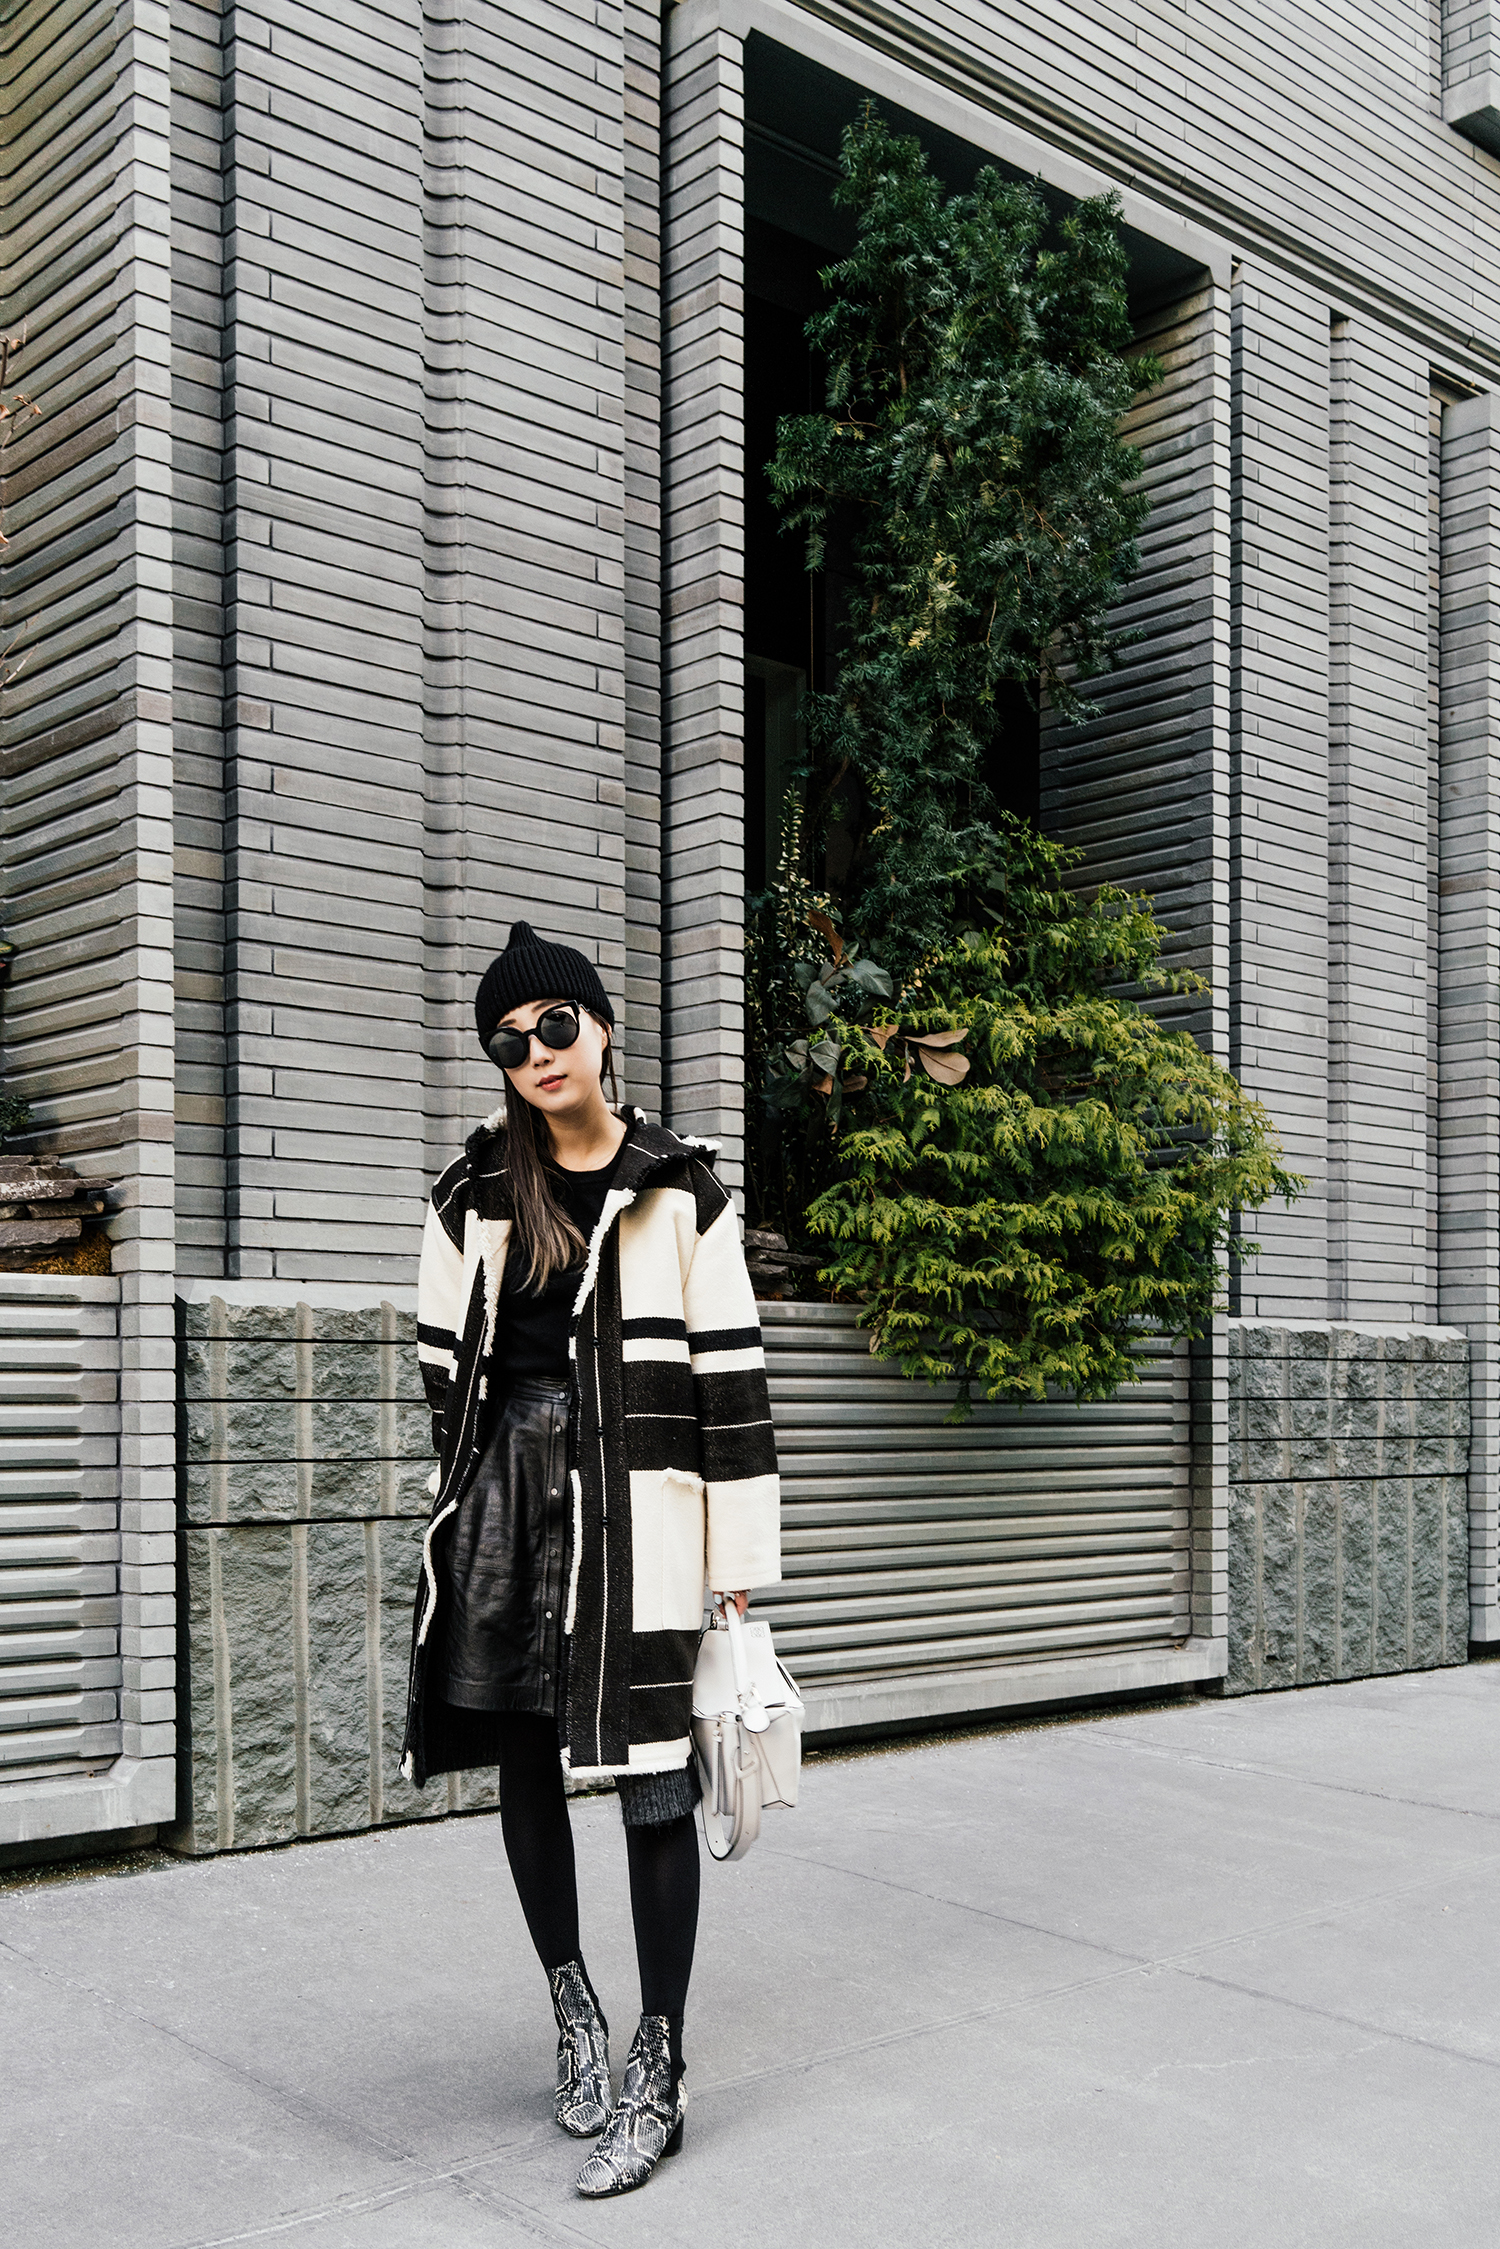 Isabel Marant Coat and  Shoes ,  Everlane Sweater ,  Vince Skirt ,  Loewe Bag ,  Fendi Sunglasses